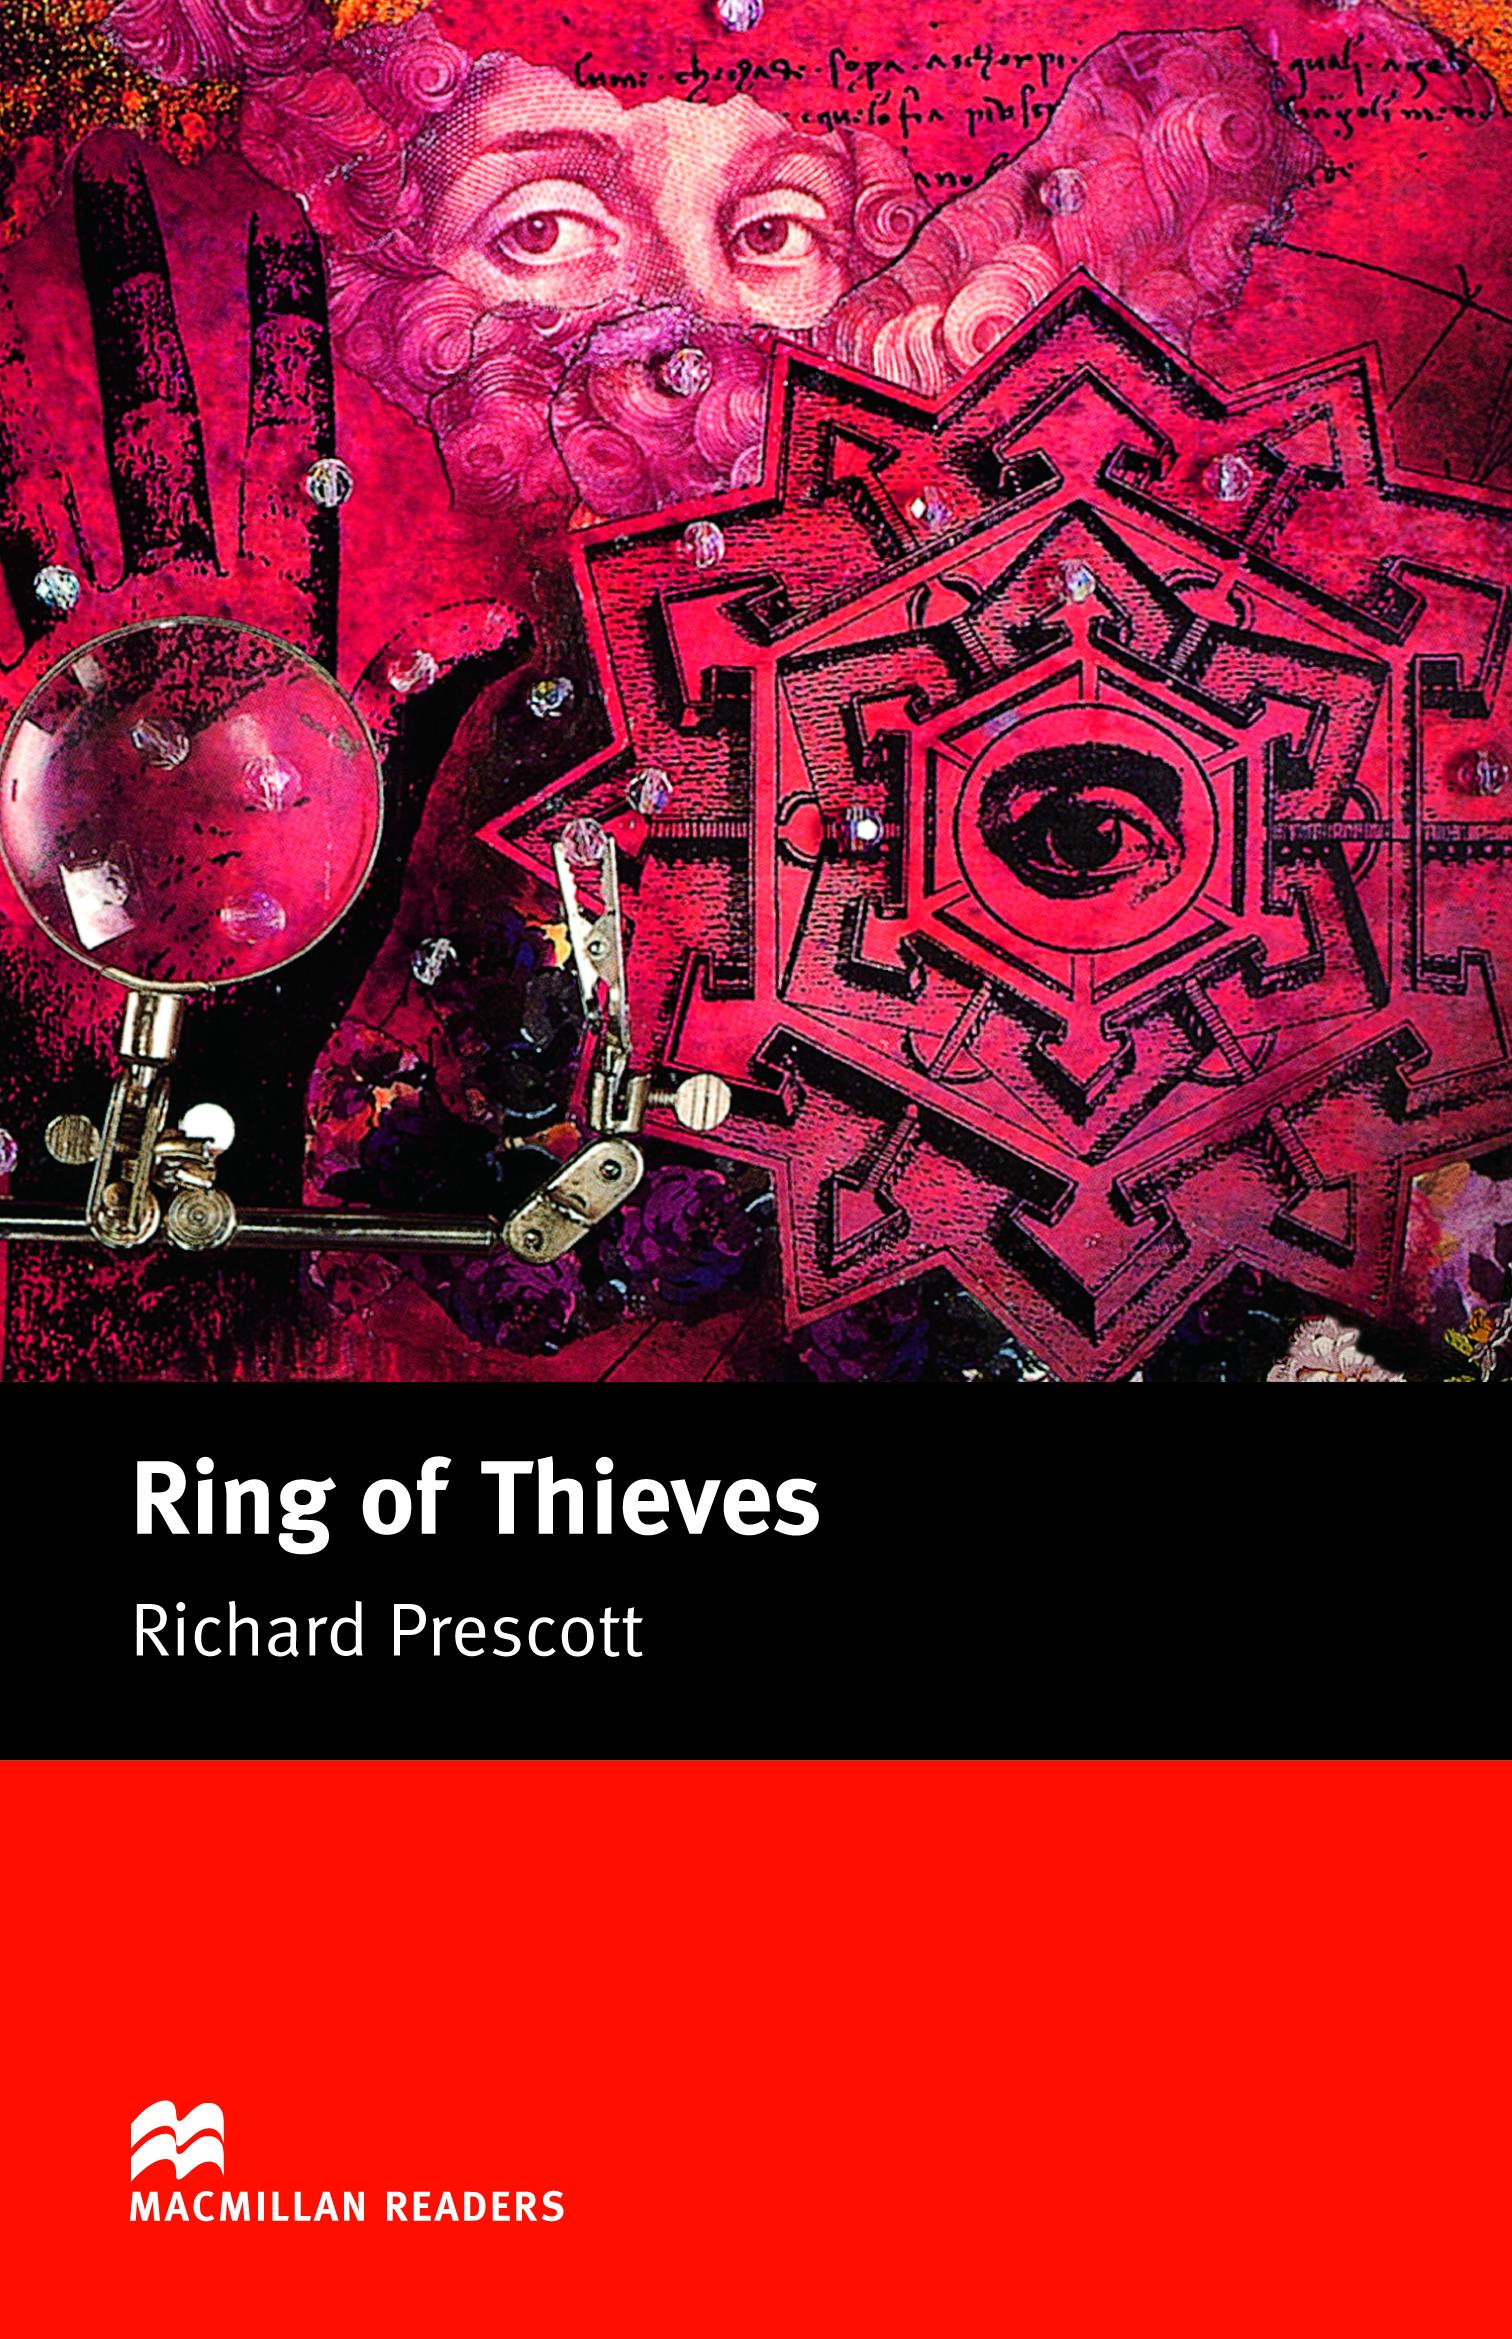 Macmillan Readers: Ring of Thieves